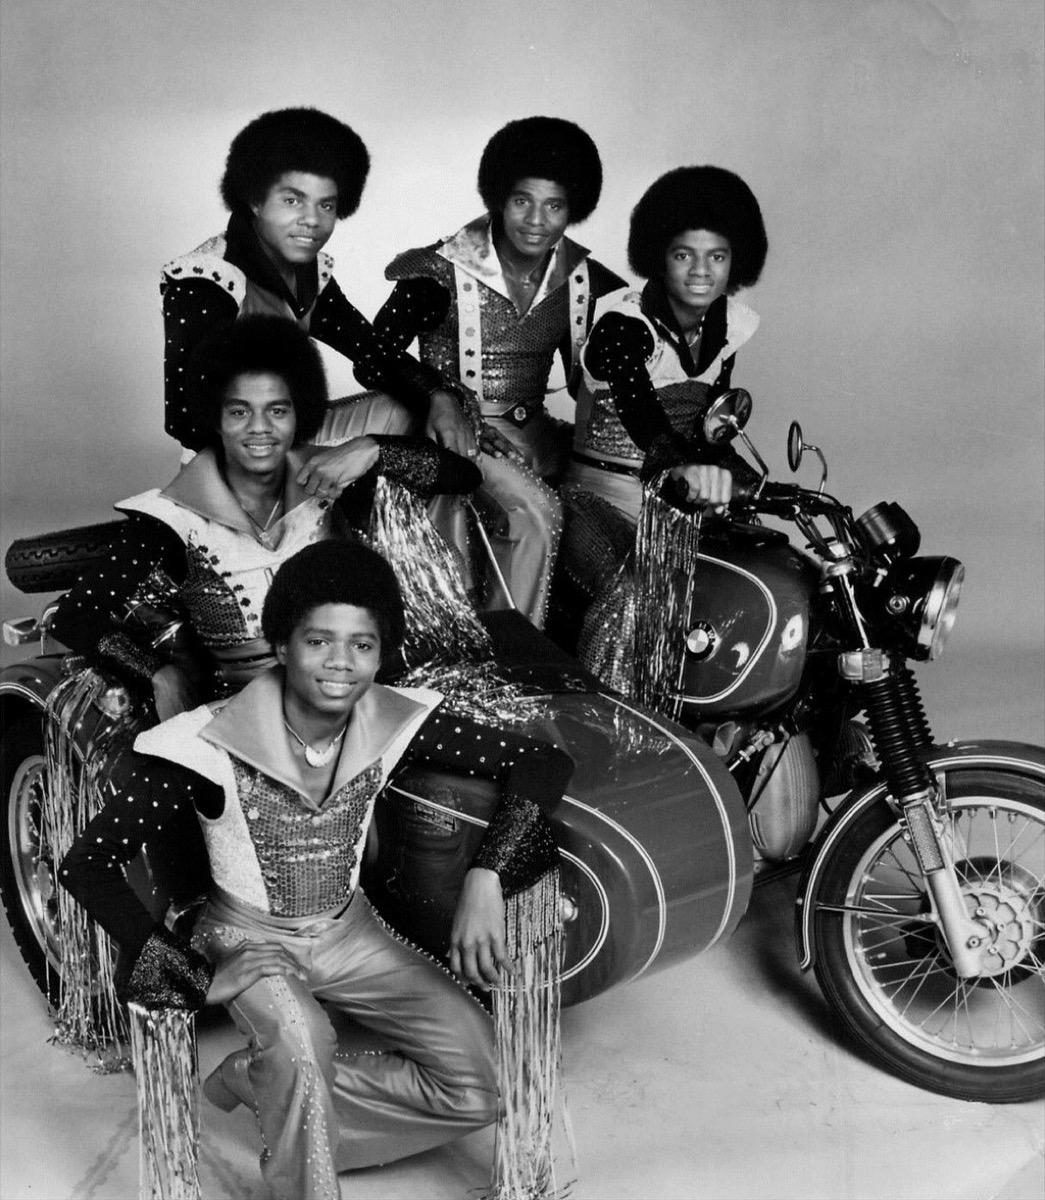 jackson five siblings that teamed up